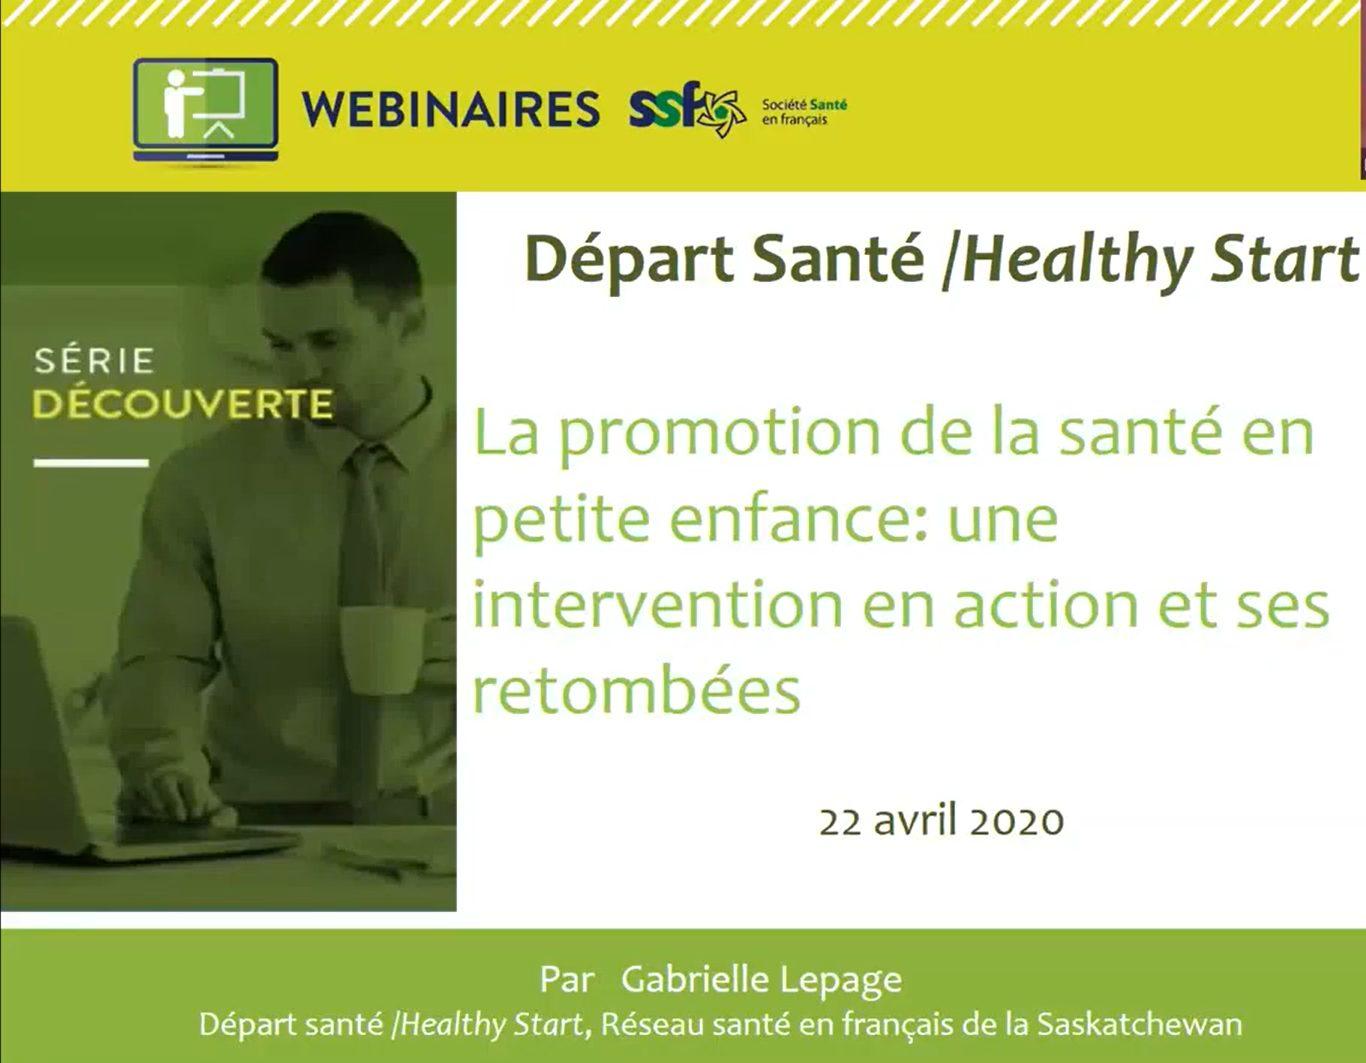 image webinaire_Depart sante